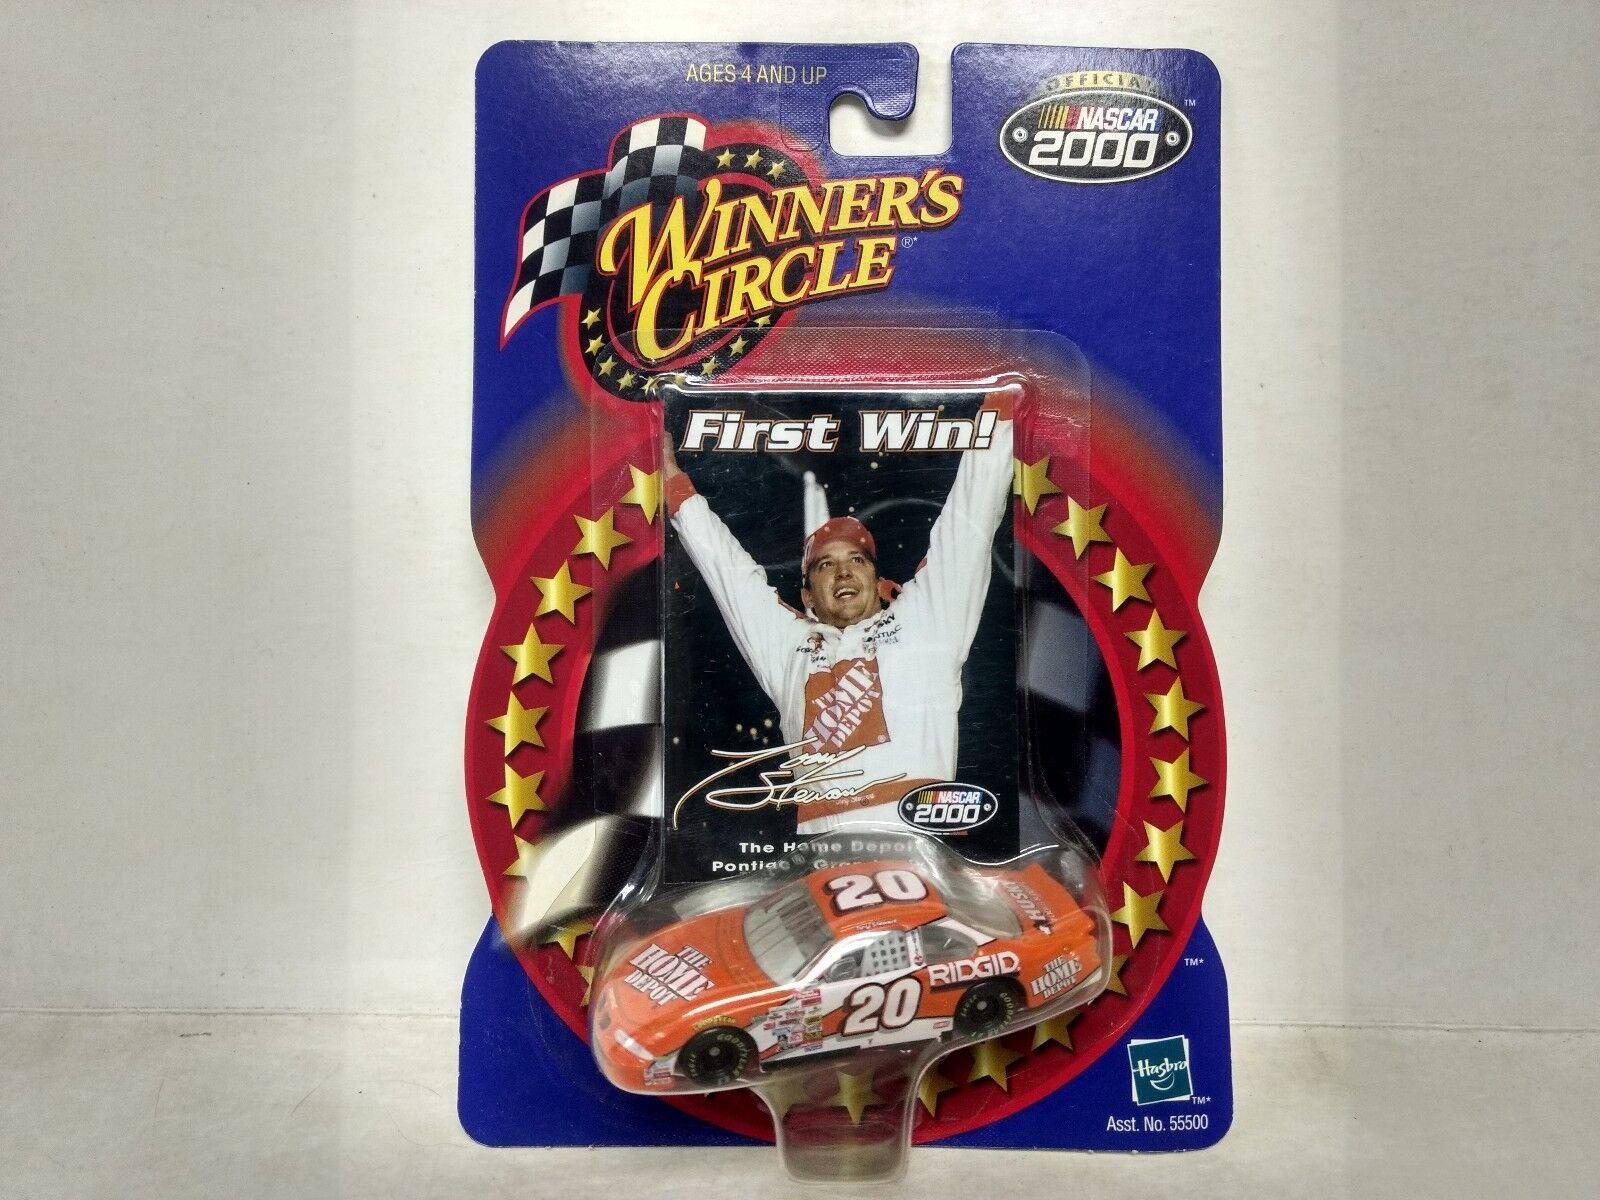 Nascar Winners Circle First Win Tony Stewart 1 64 Scale Diecast mb35